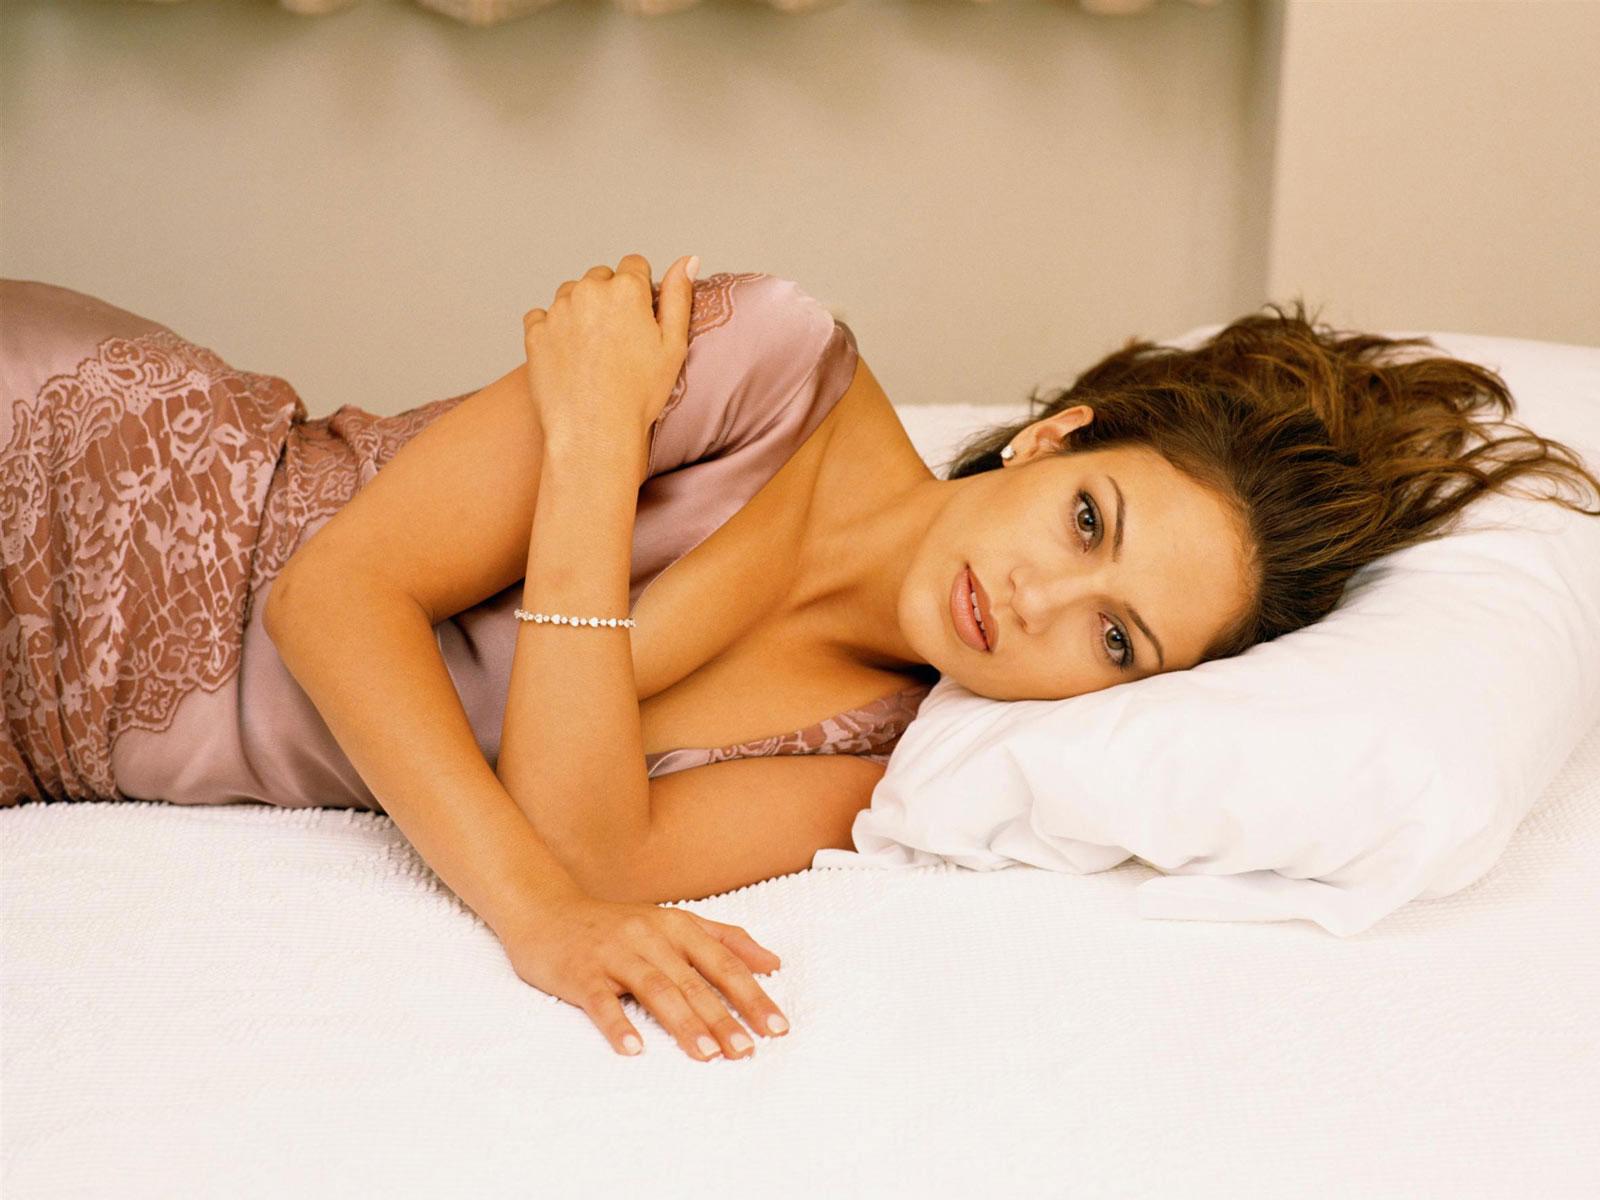 Jennifer Lopez 51 wallpaper download